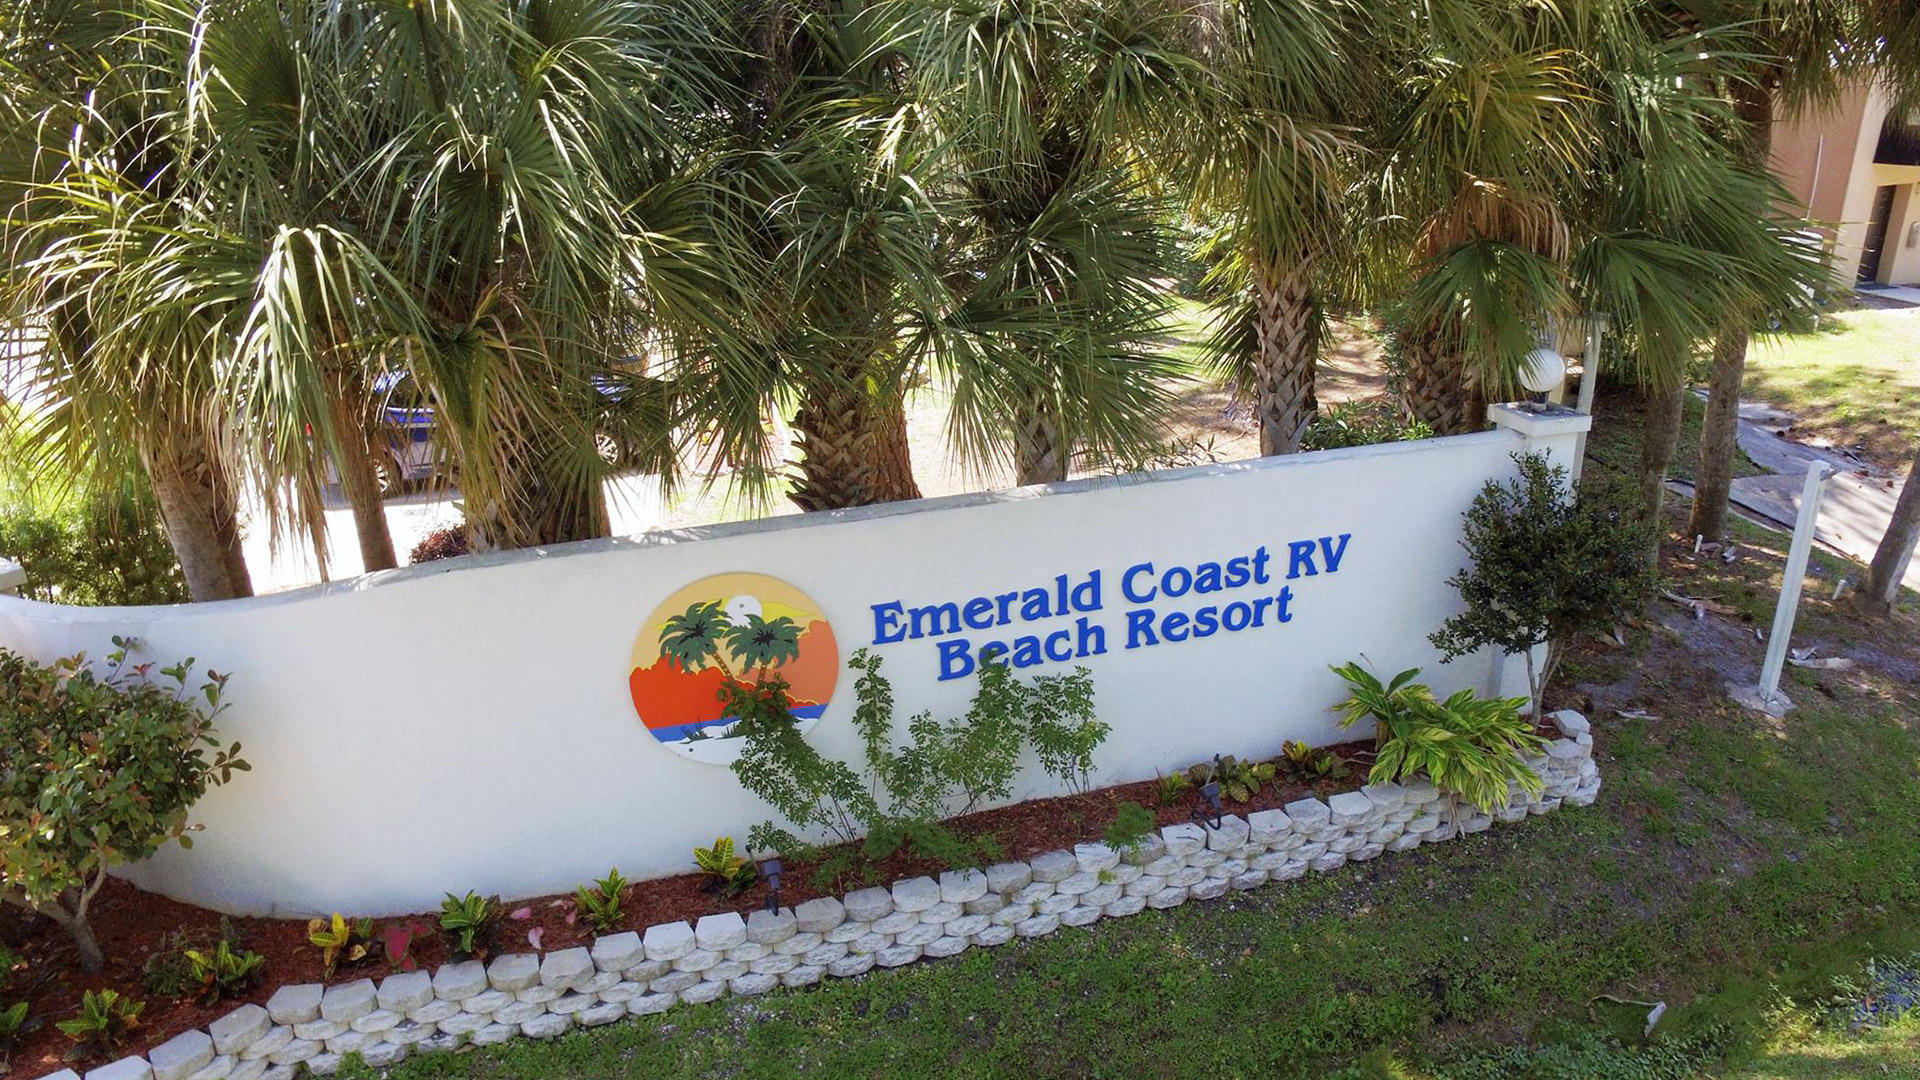 Emerald Coast RV Resort by Sun Homes New Homes for Sale - Panama City  Beach, FL - 16 Photos | Trulia